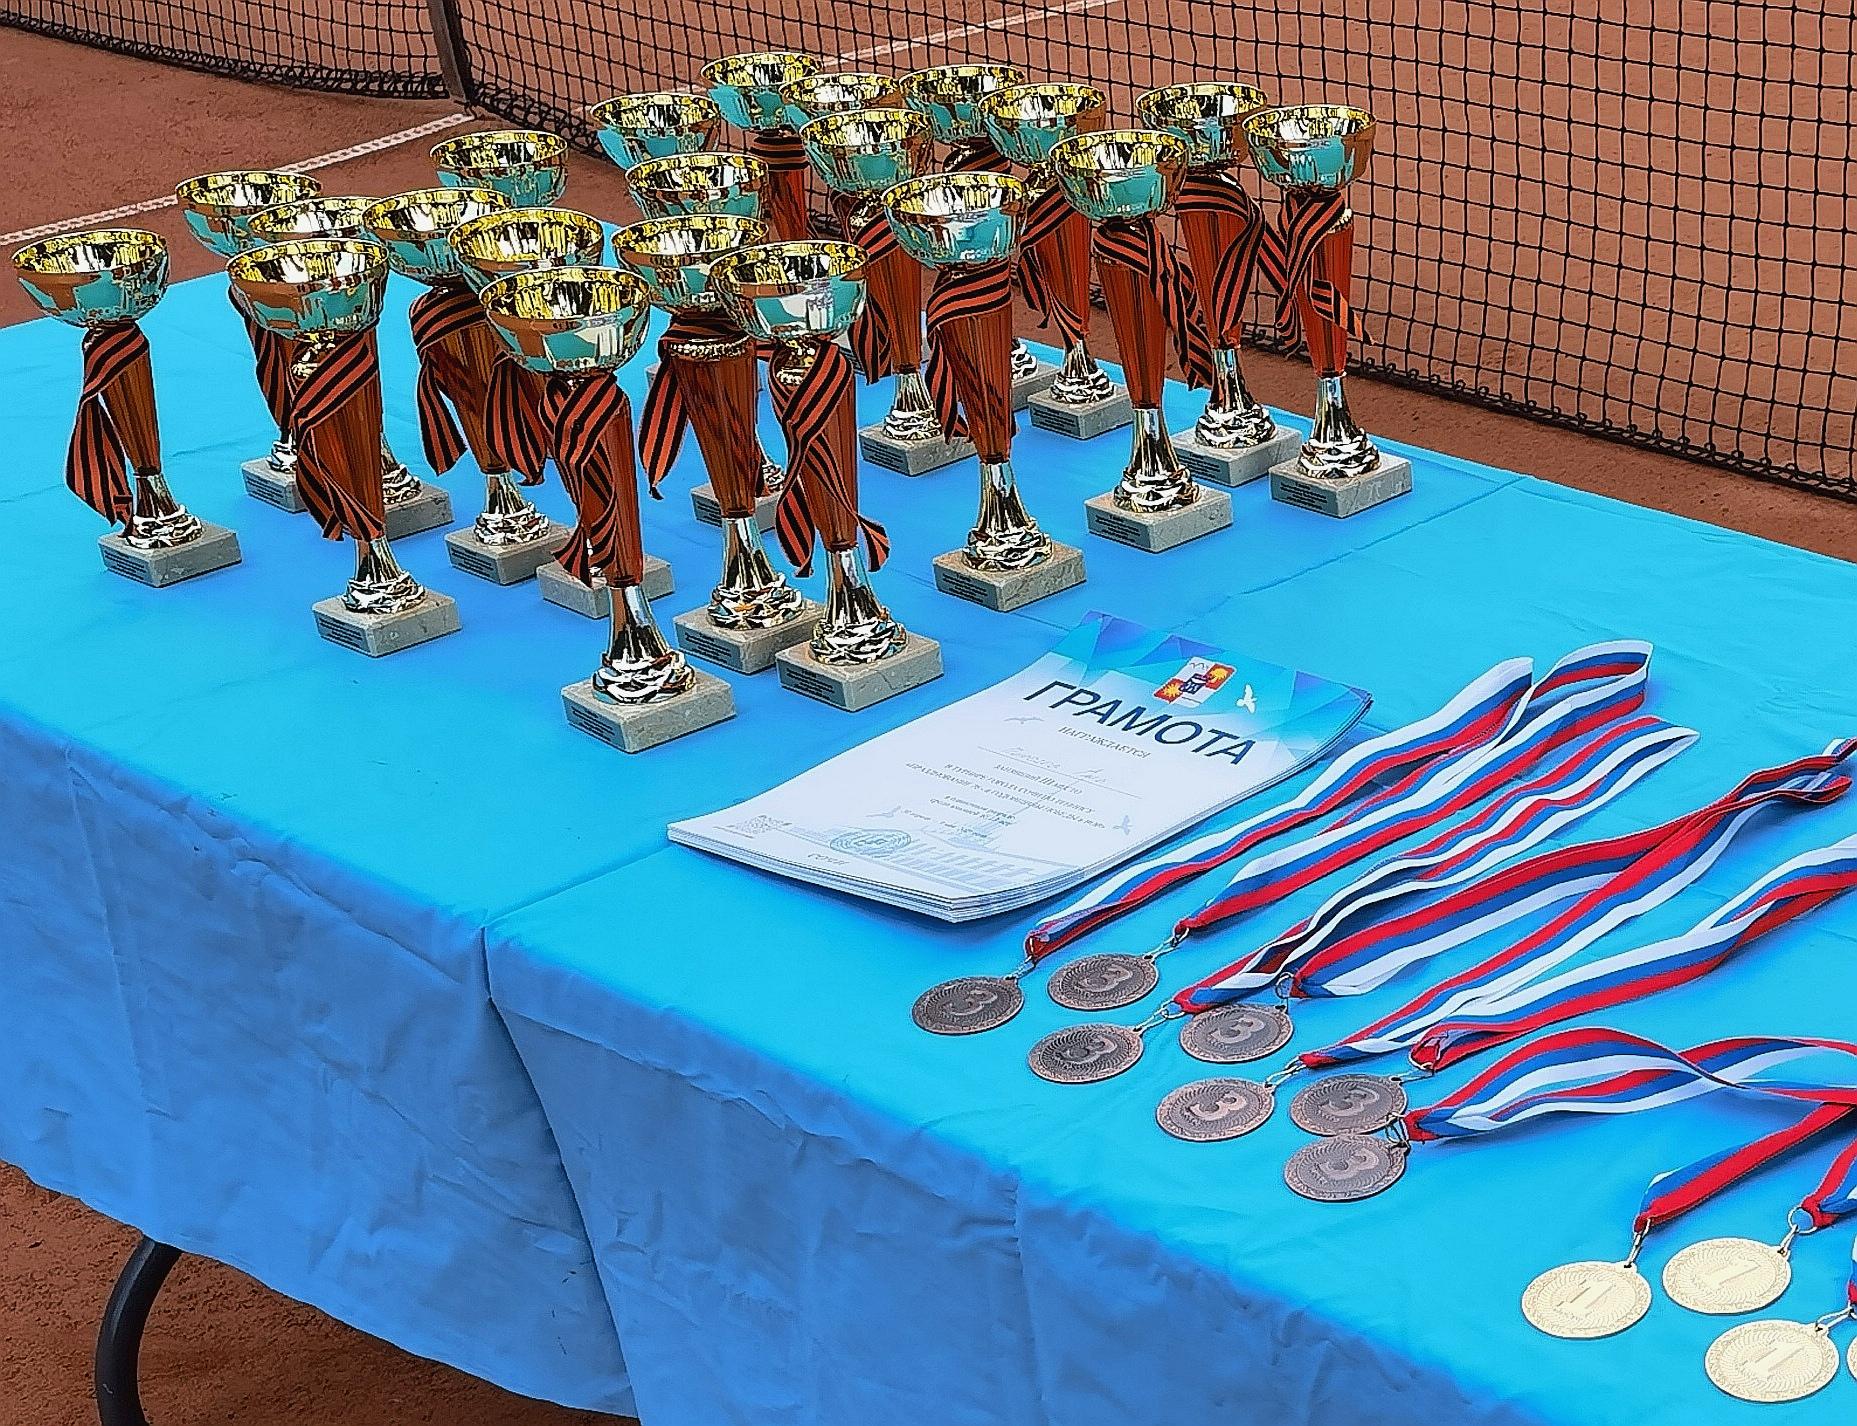 Турнир города Сочи по теннису